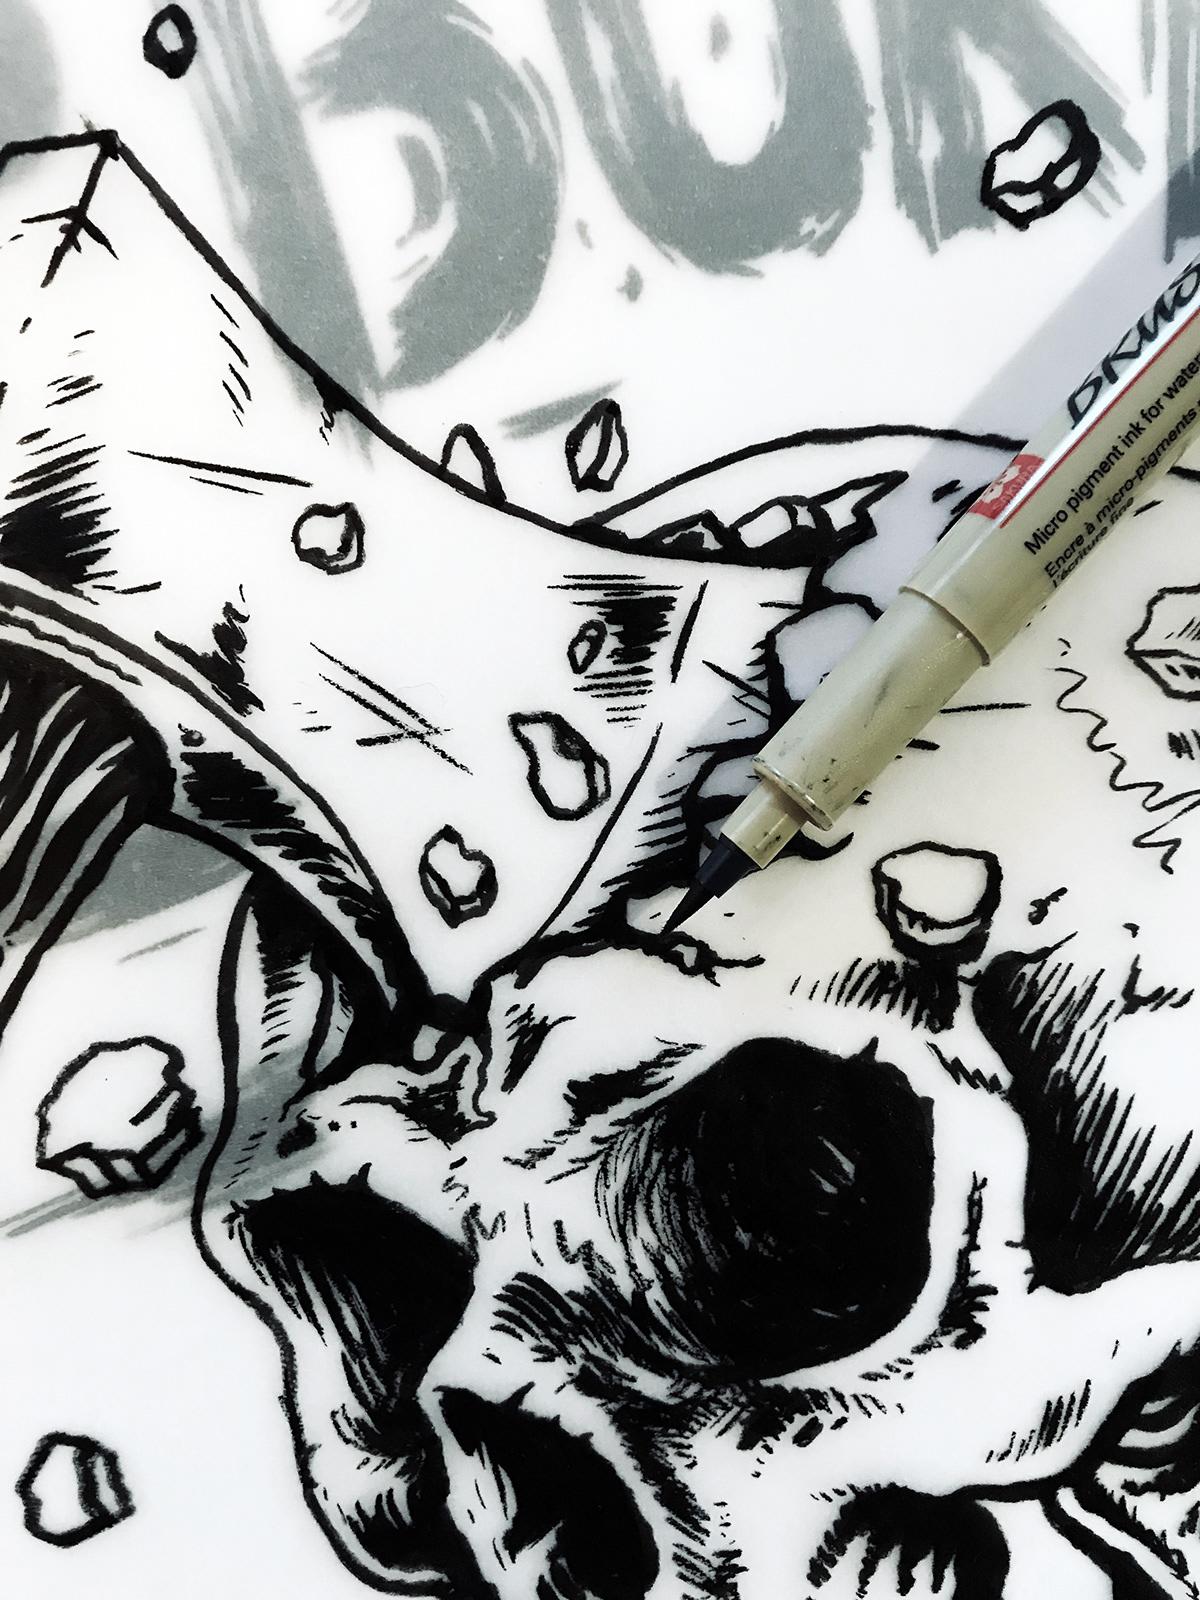 Image may contain: drawing, cartoon and book